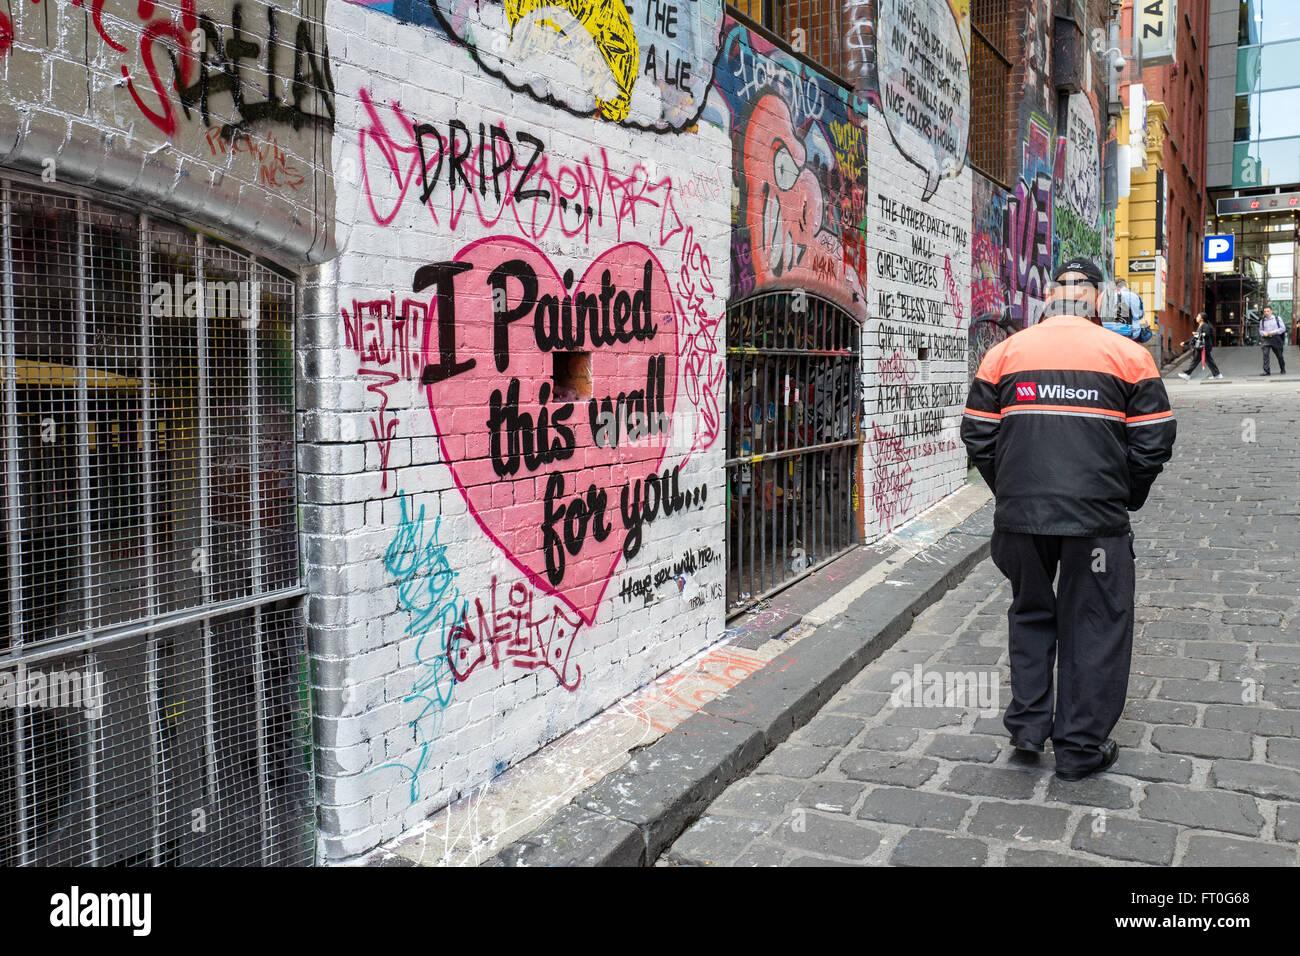 Hosier Lane en Melbourne es famosa por sus graffiti y street art Imagen De Stock